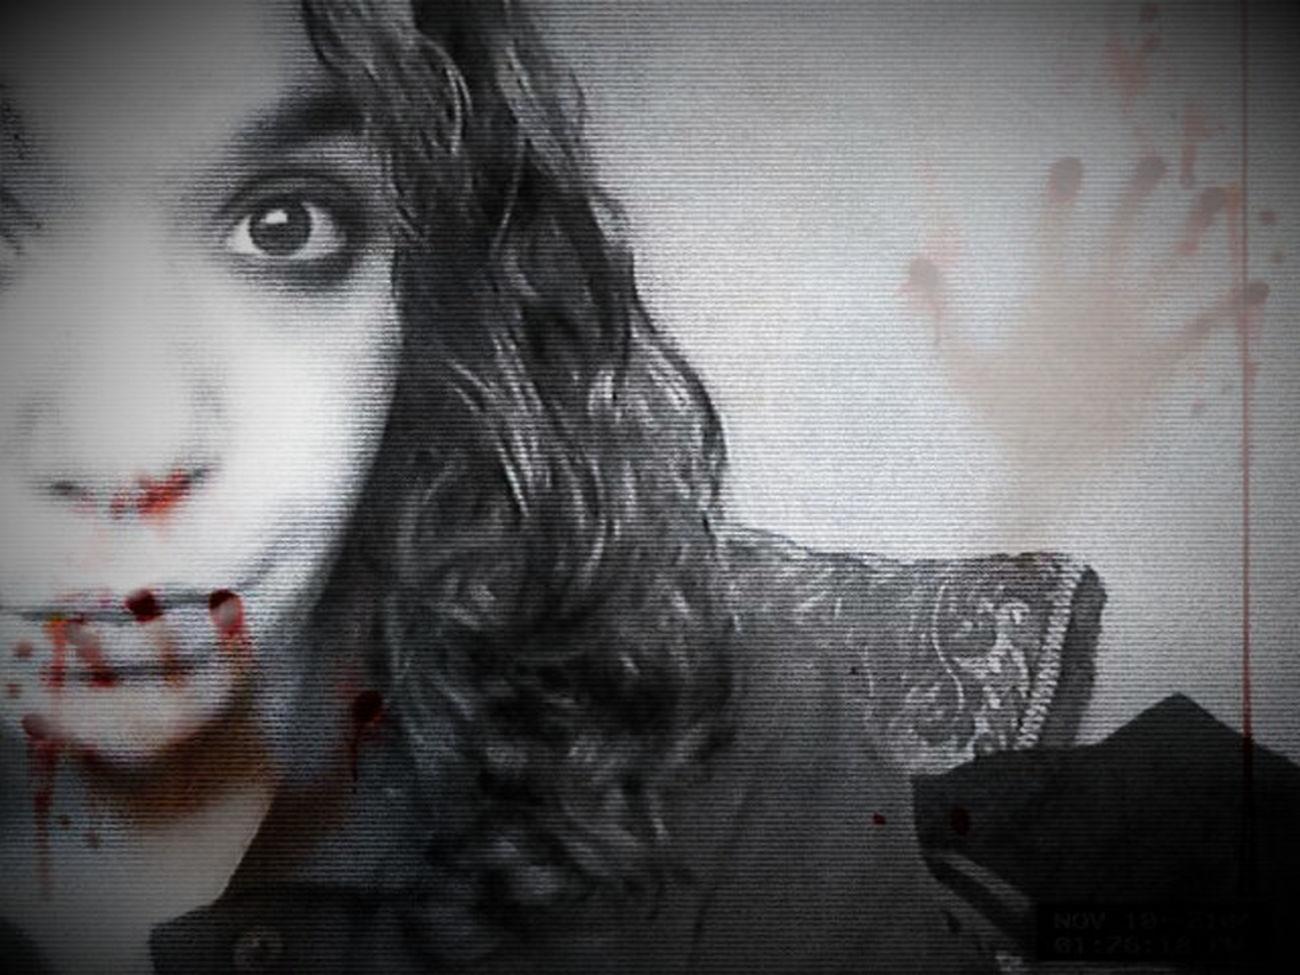 Halloween Horrors Enjoying Life That's Me Makayn_maydar